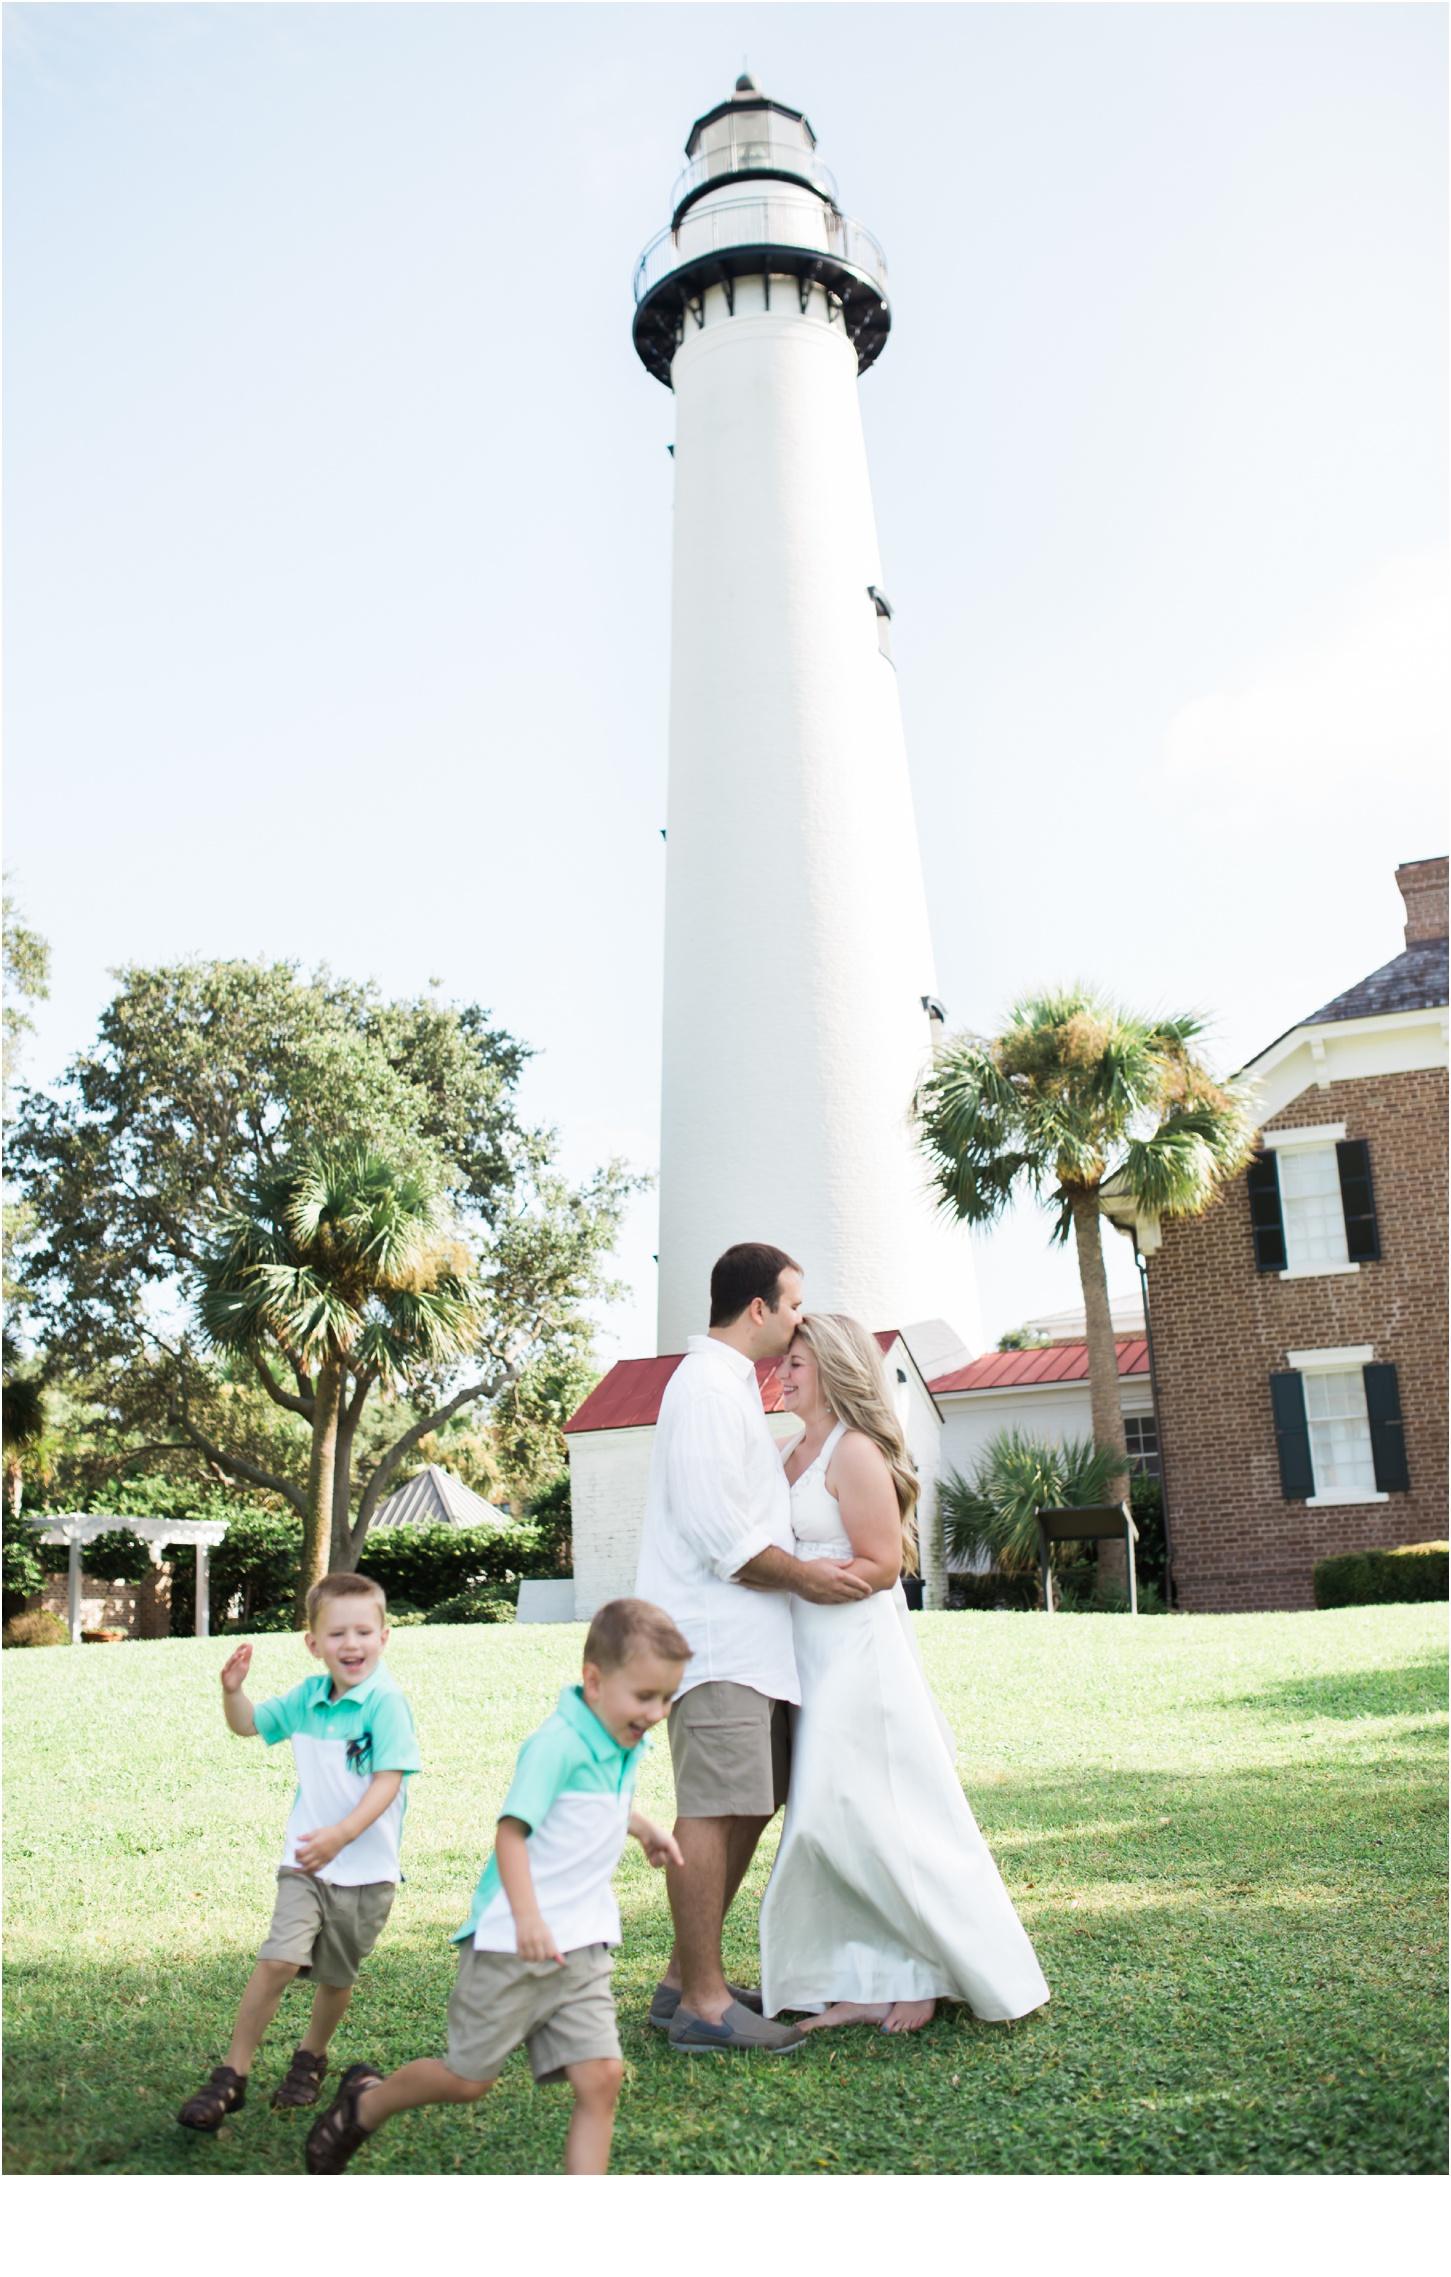 Rainey_Gregg_Photography_St._Simons_Island_Georgia_California_Wedding_Portrait_Photography_0133.jpg